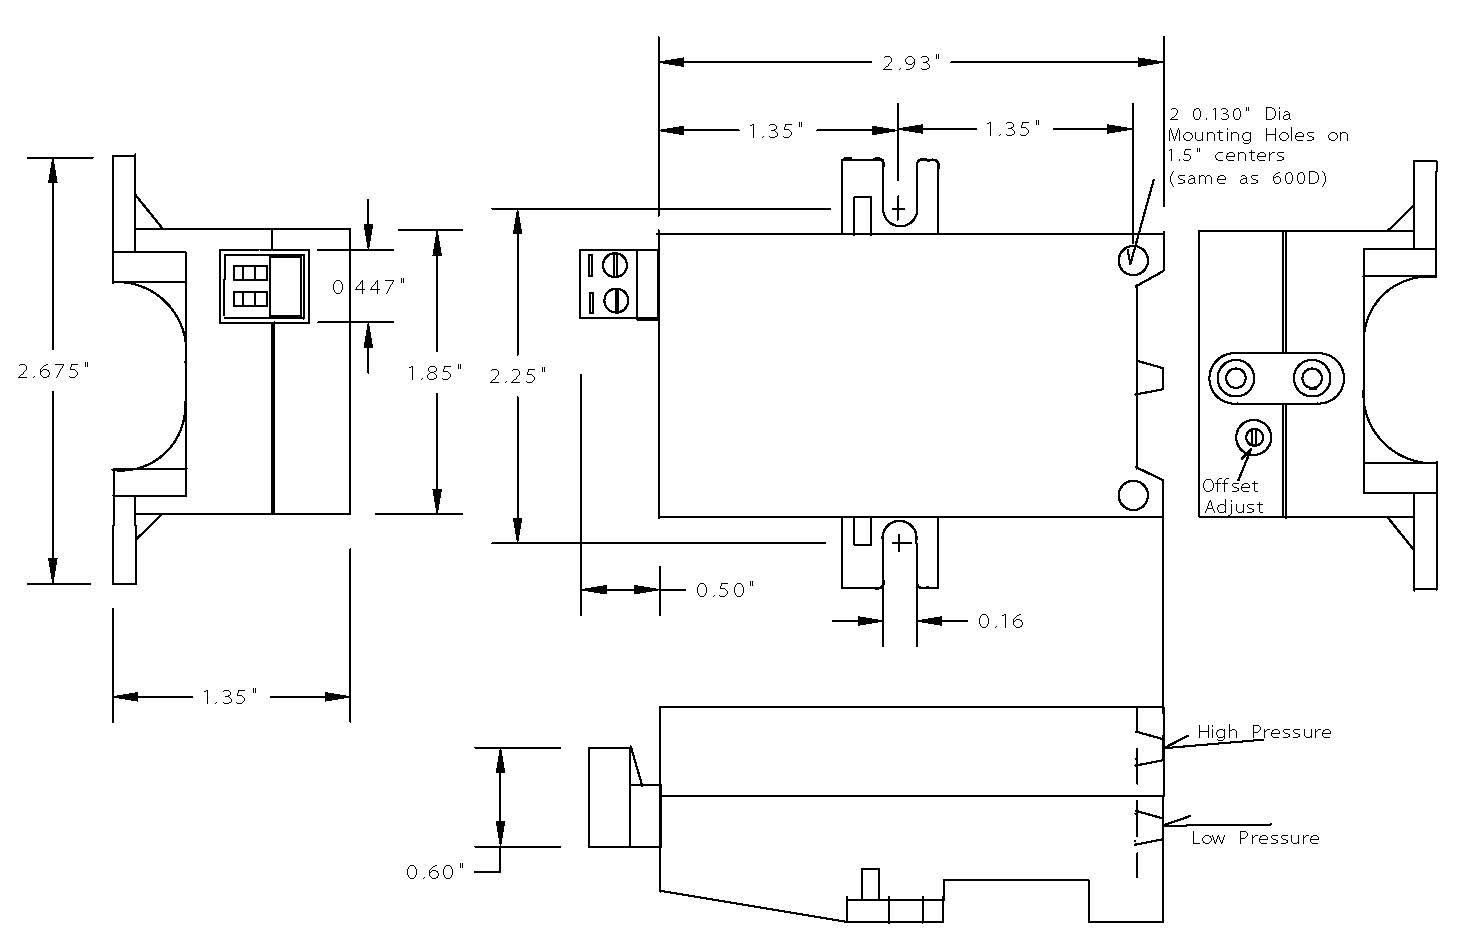 rtd probe wiring-diagram, motion detector lights wiring-diagram, rs485 wiring-diagram, rs232 wiring-diagram, encoder wiring-diagram, rs-422 wiring-diagram, devicenet wiring-diagram, pyrometer wiring-diagram, 4 wire transmitter wiring-diagram, potentiometer wiring-diagram, daisy chain wiring-diagram, plc analog input card wiring-diagram, 24vdc wiring-diagram, profibus wiring-diagram, usb wiring-diagram, 7 round wiring-diagram, 4 wire rtd wiring-diagram, transducer wiring-diagram, ssr wiring-diagram, on 4 20ma pressure sensor wiring diagrams